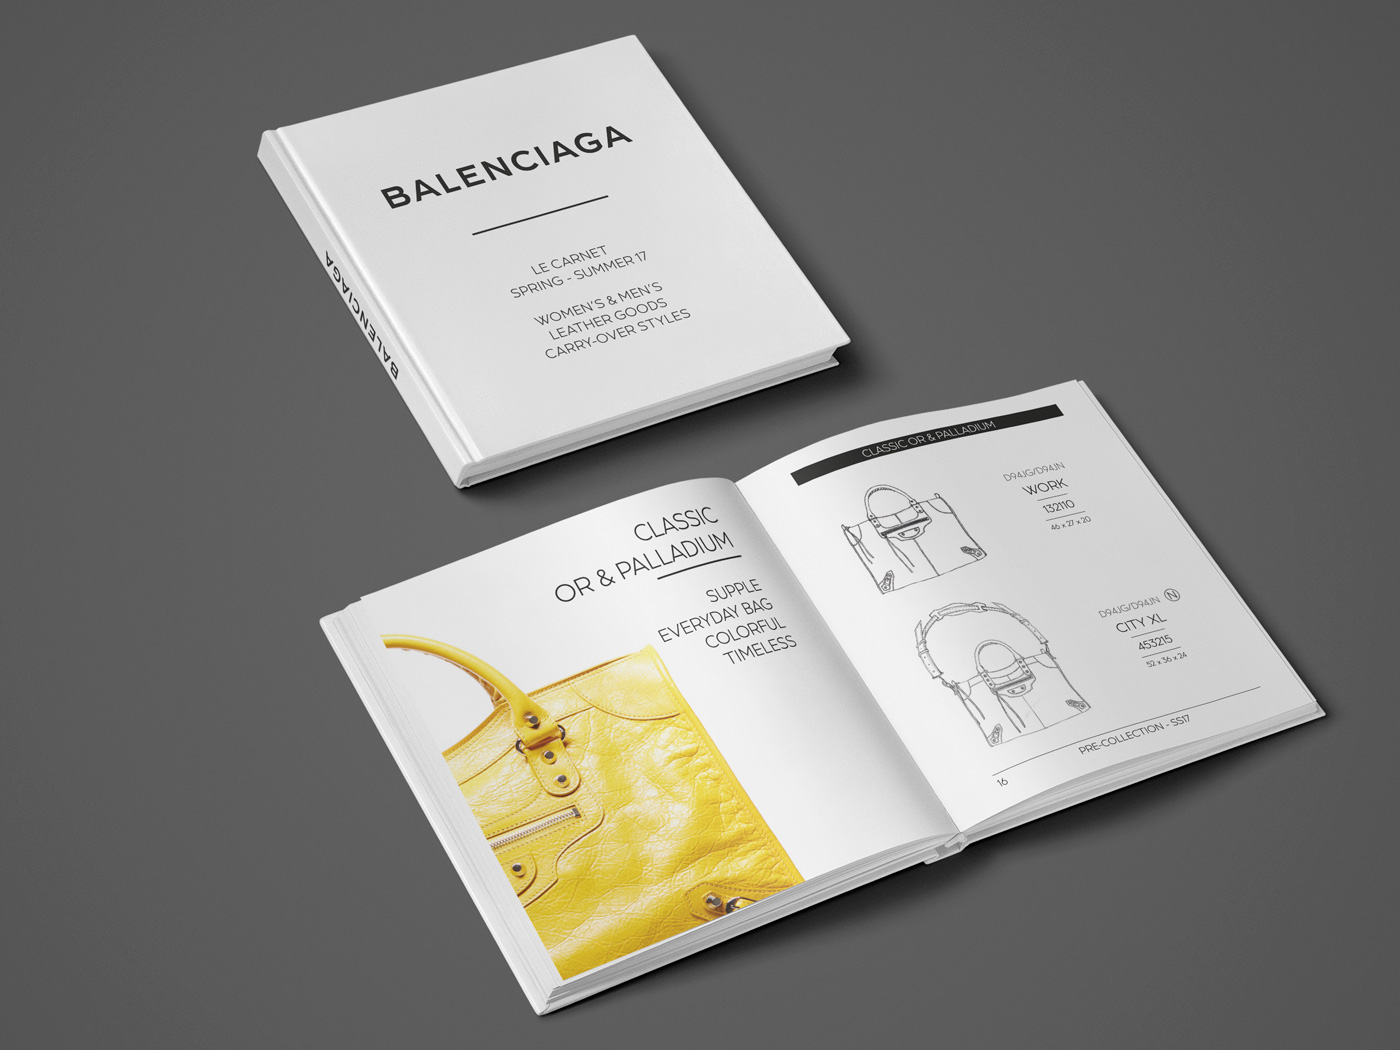 Balenciaga - Le Carnet des collections - Damien Rossier